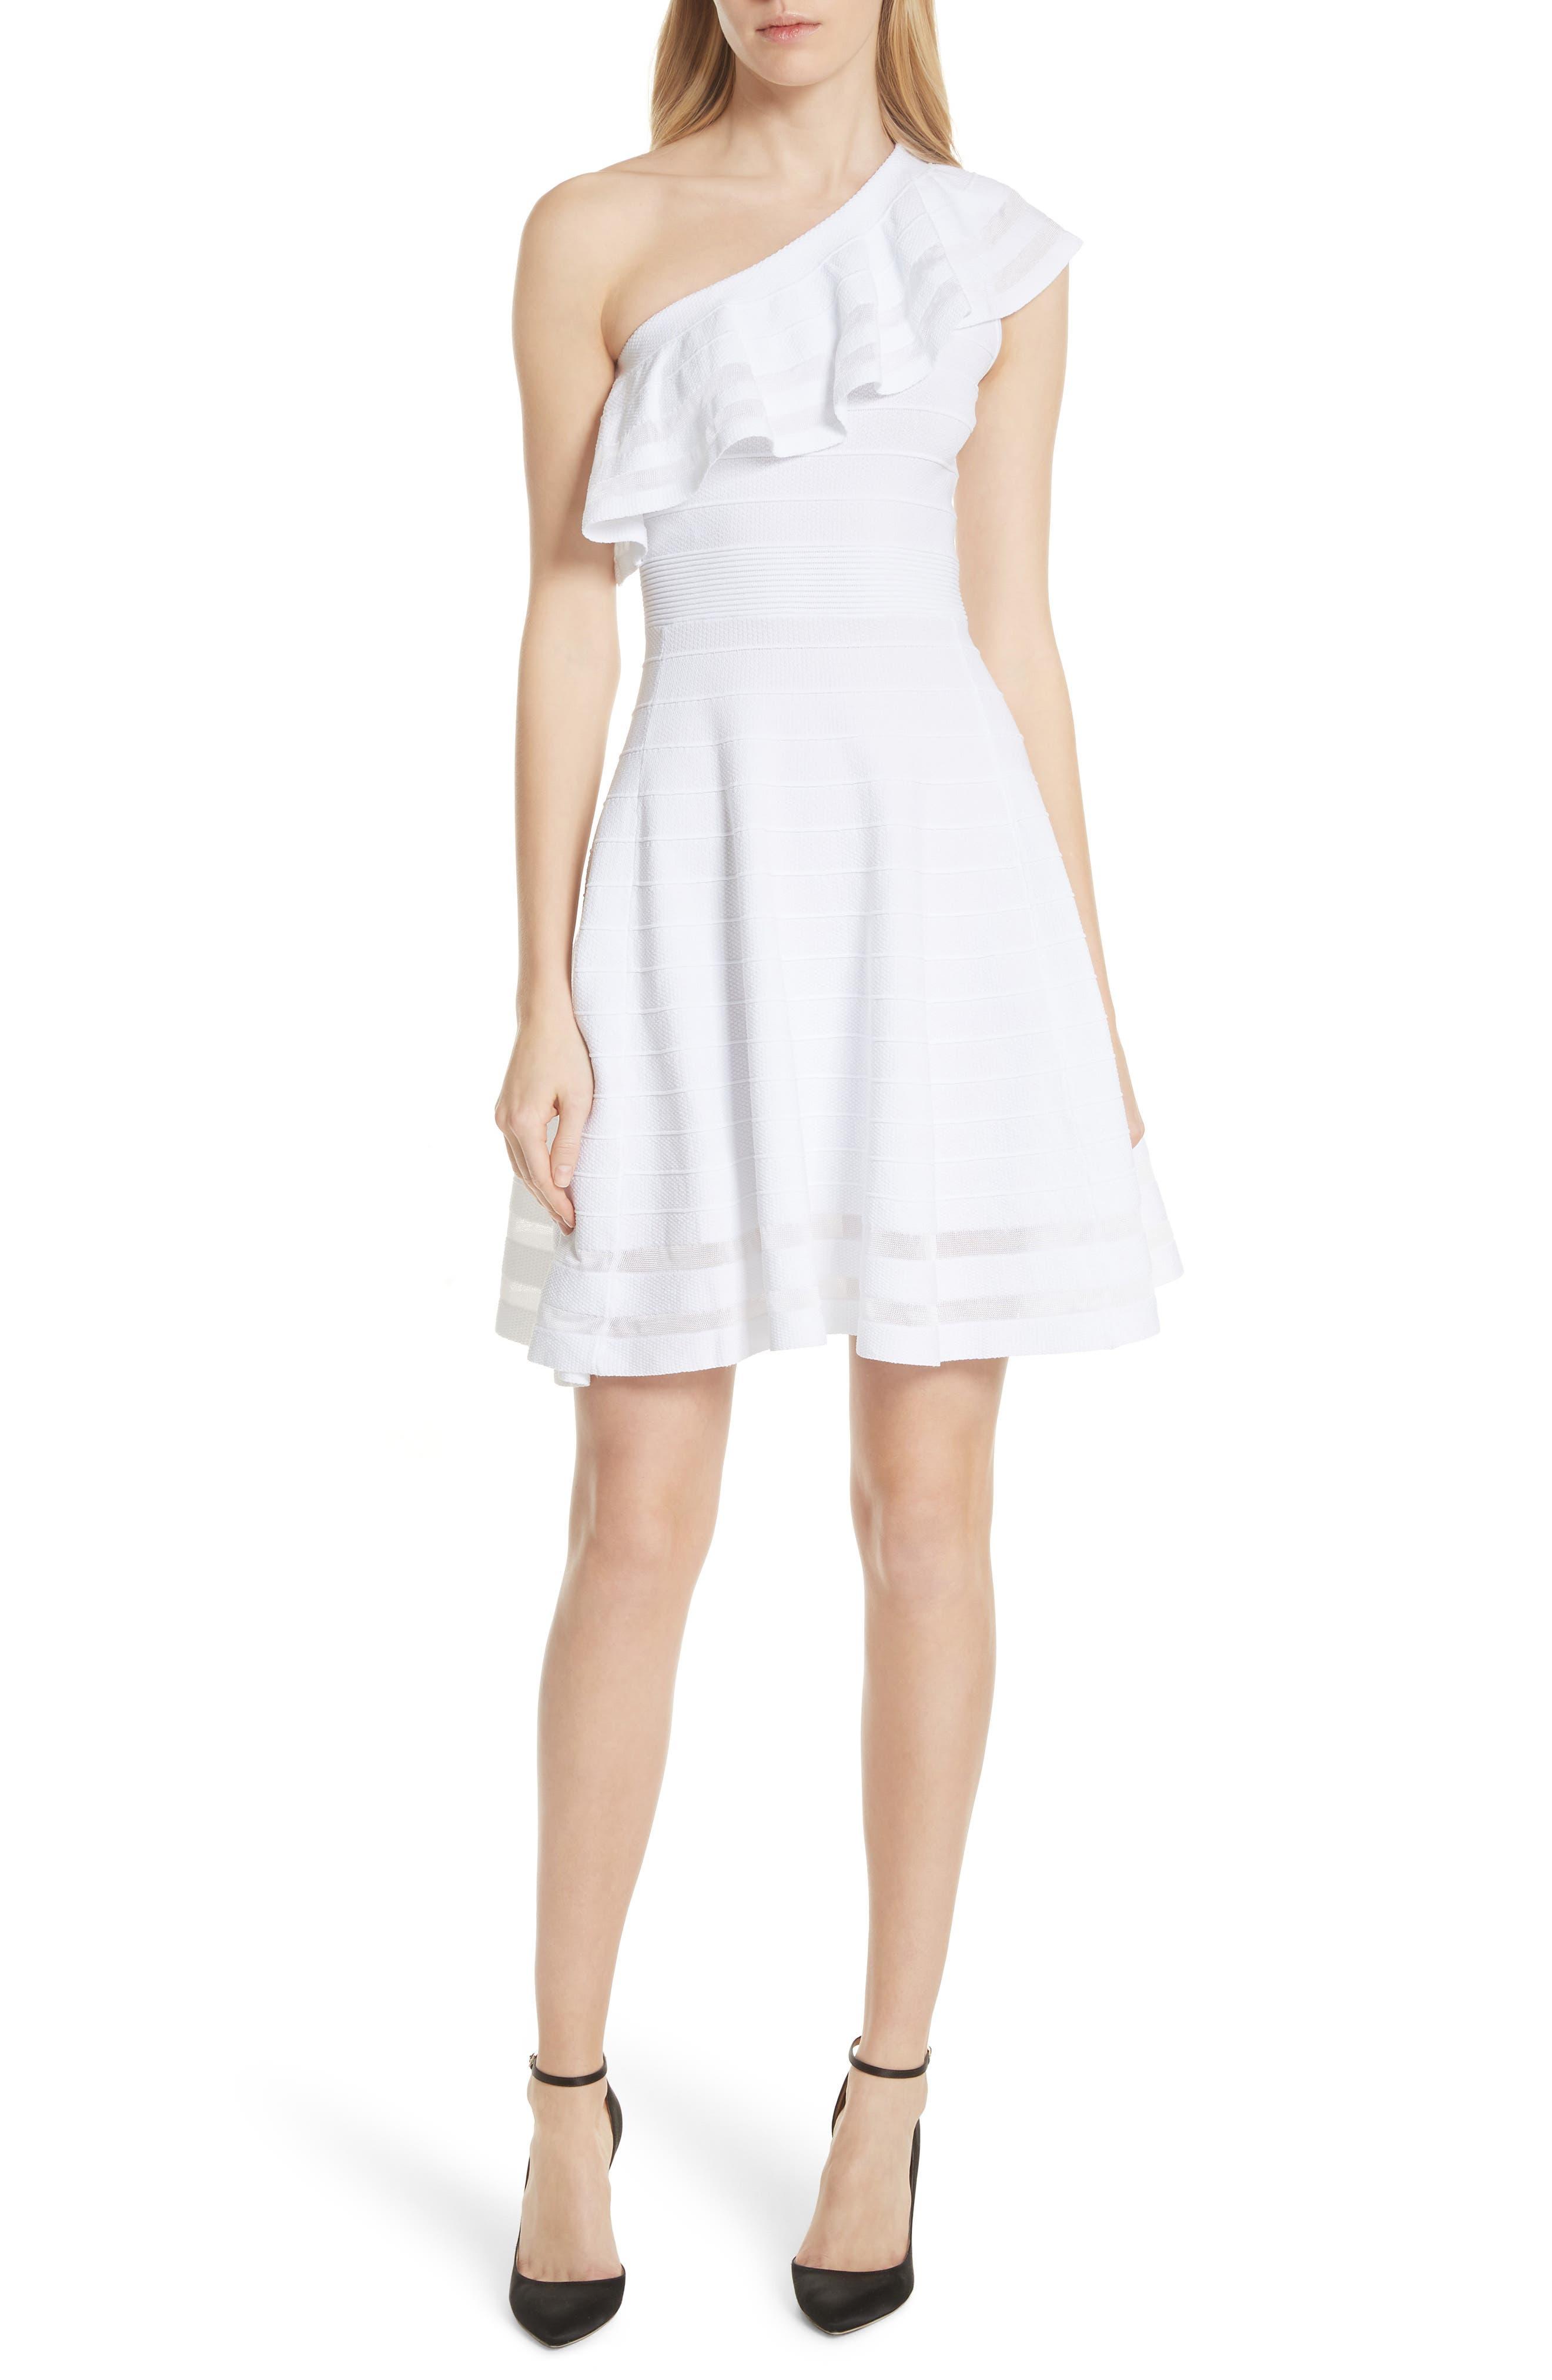 Streena Knit Skater Dress,                         Main,                         color, 110